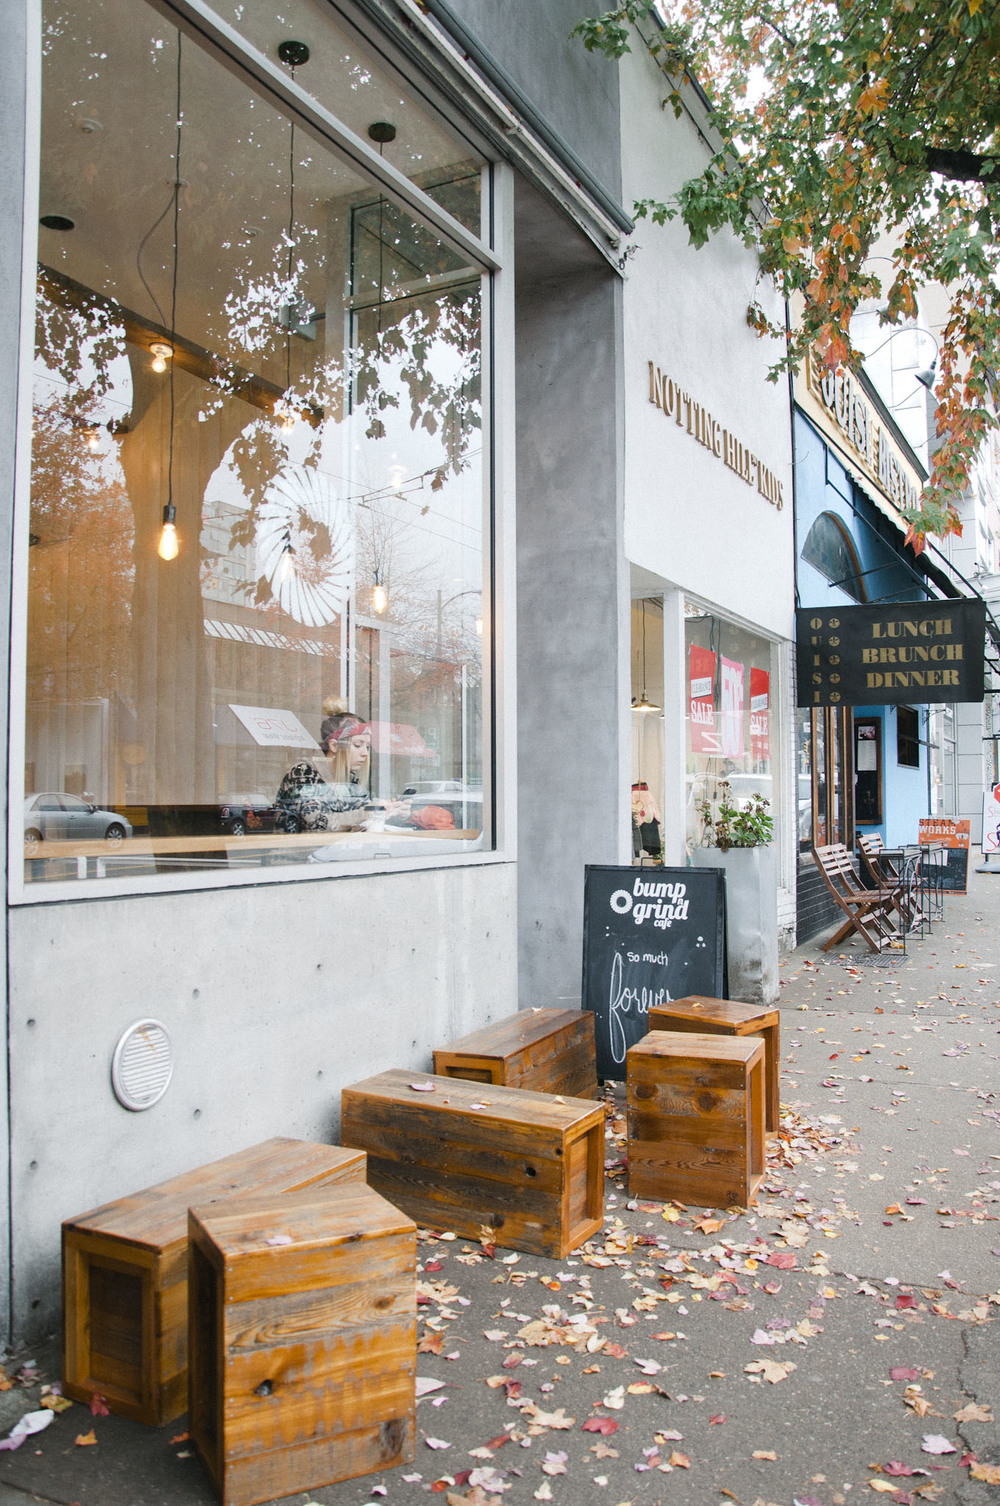 BUMP N' GRIND CAFE